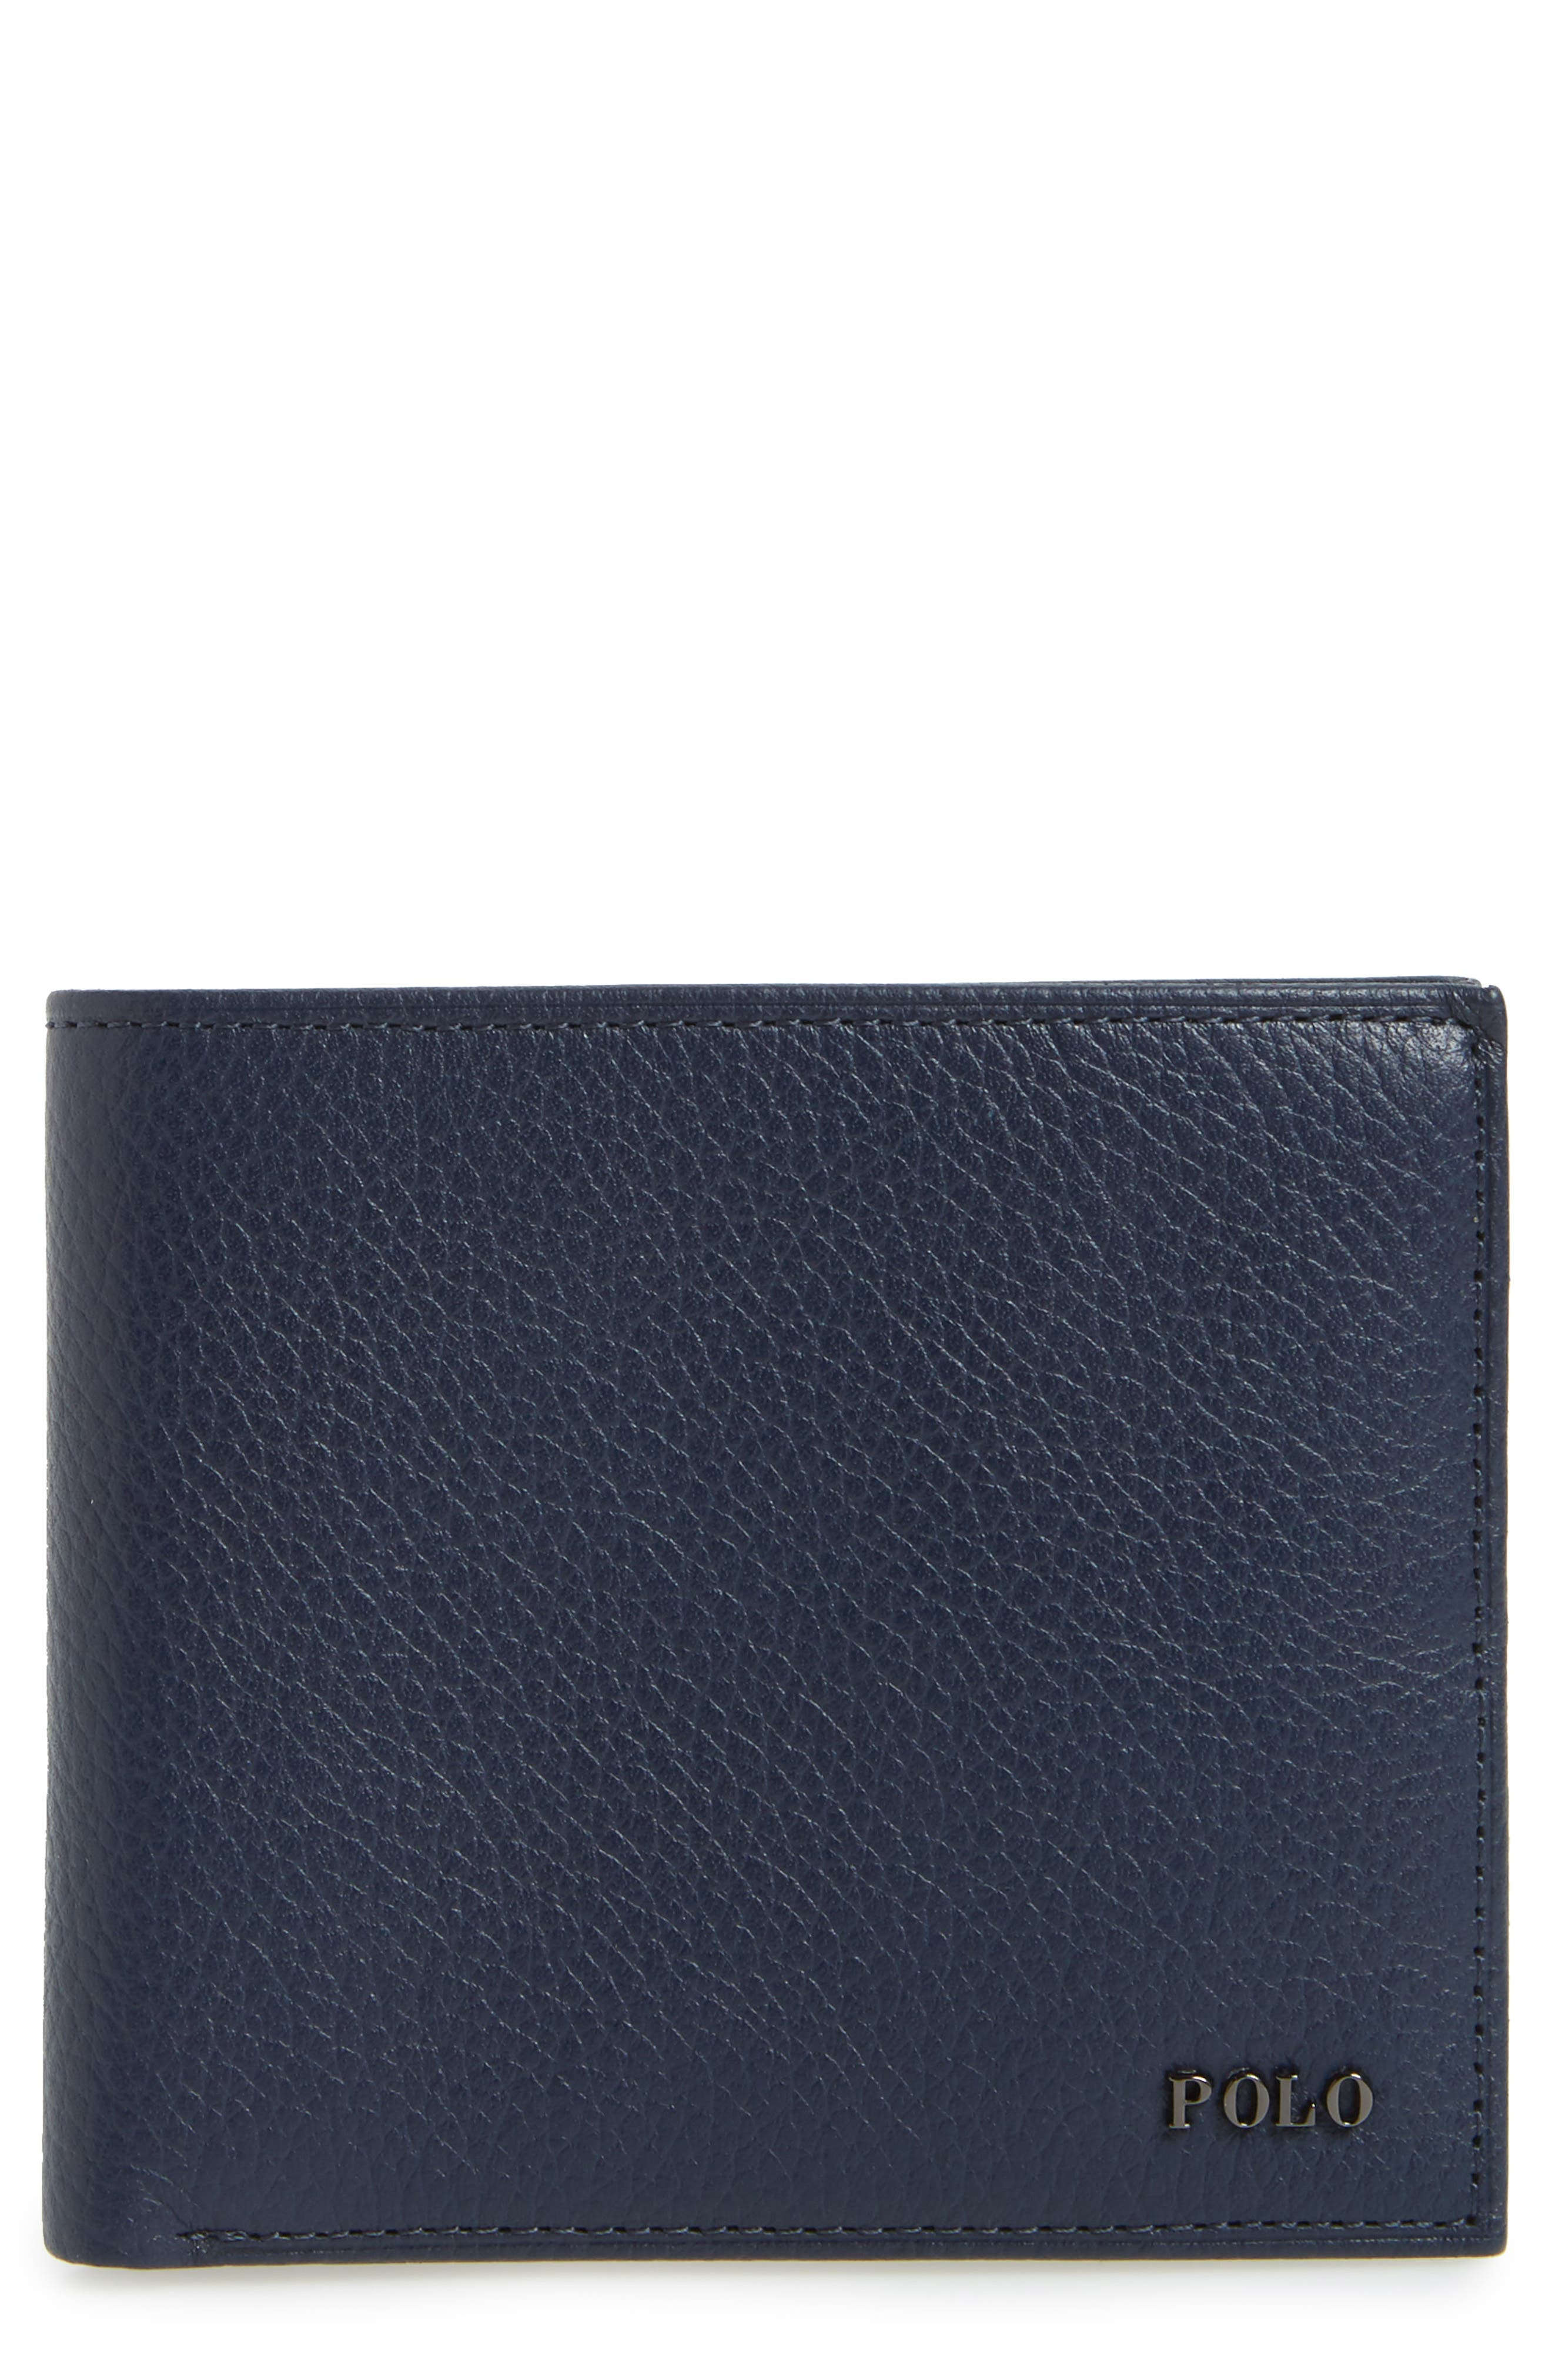 Main Image - Polo Ralph Lauren Leather Wallet